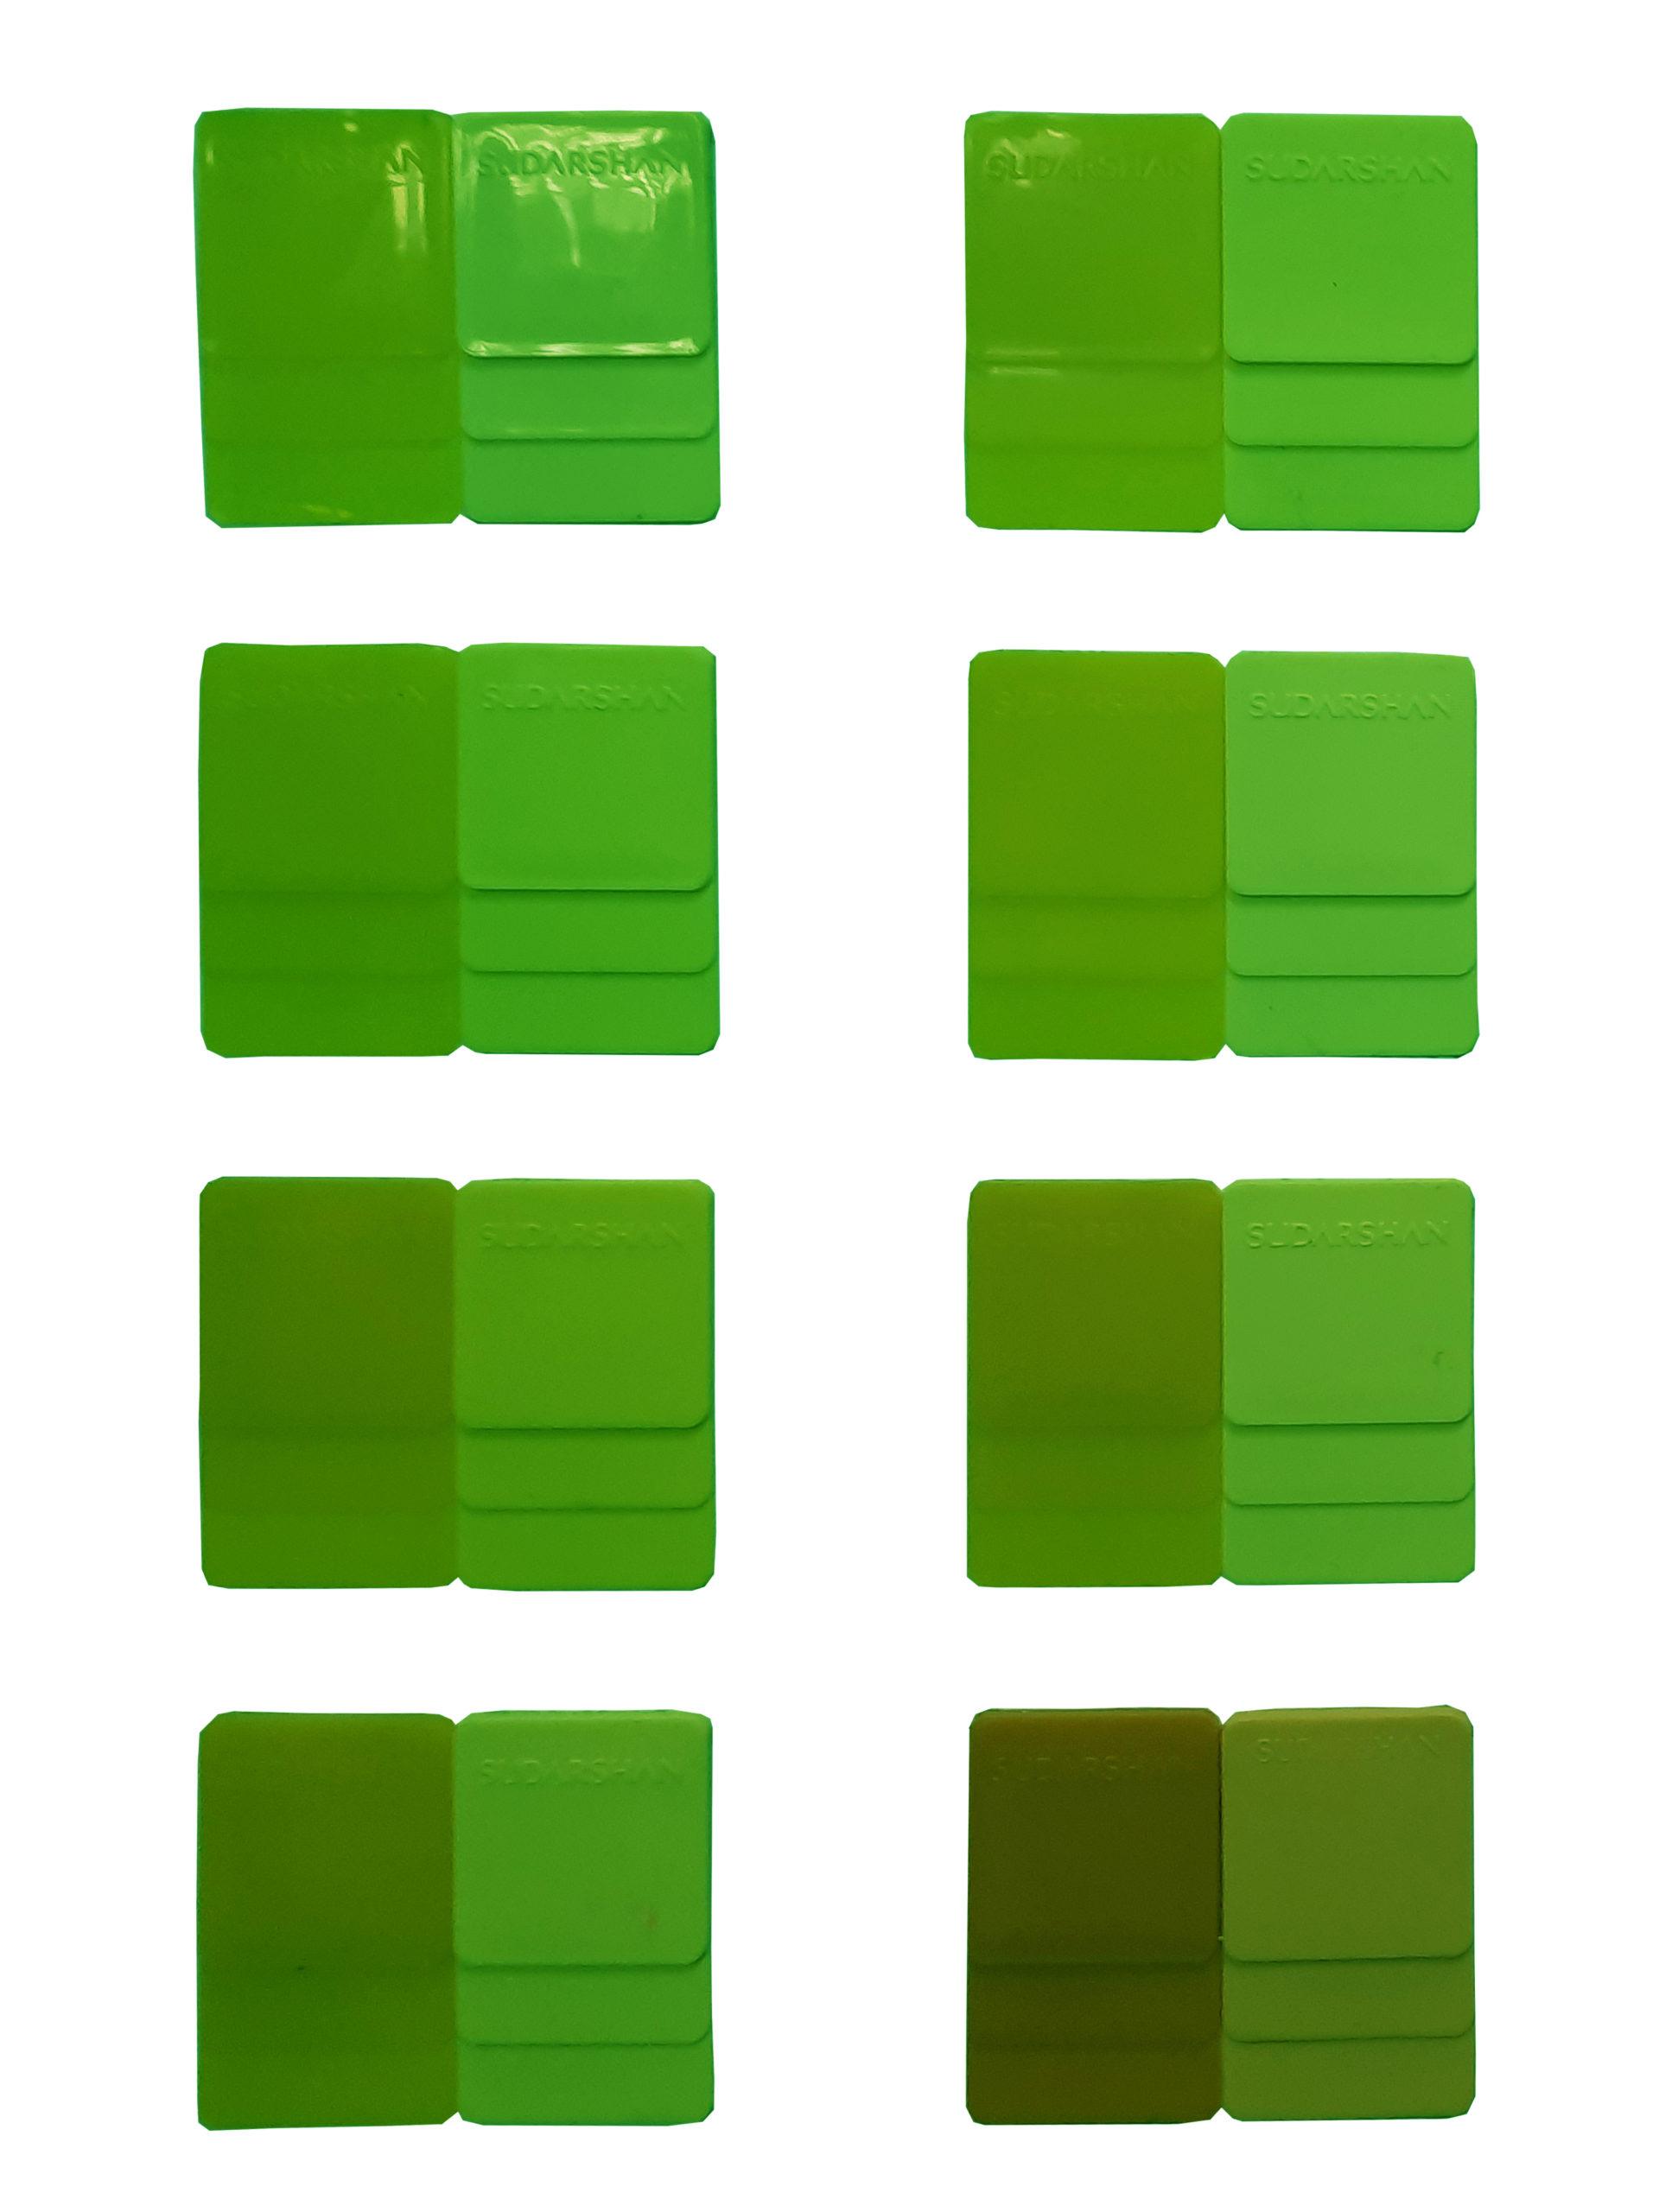 http://denovaspb.ru/wp-content/uploads/2021/04/Obrazcy_green-scaled.jpg